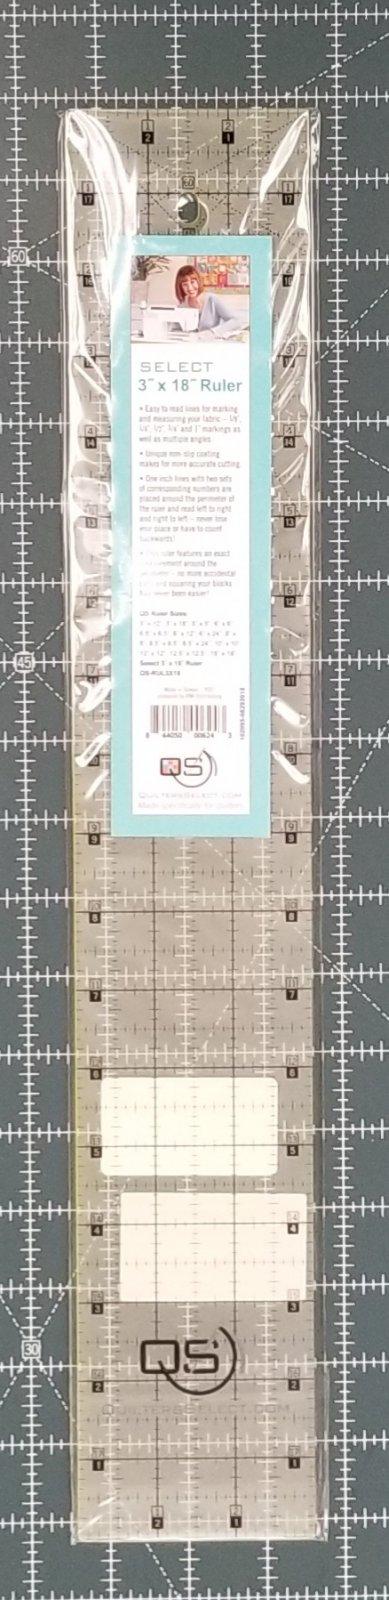 Select 3 x 18 Ruler